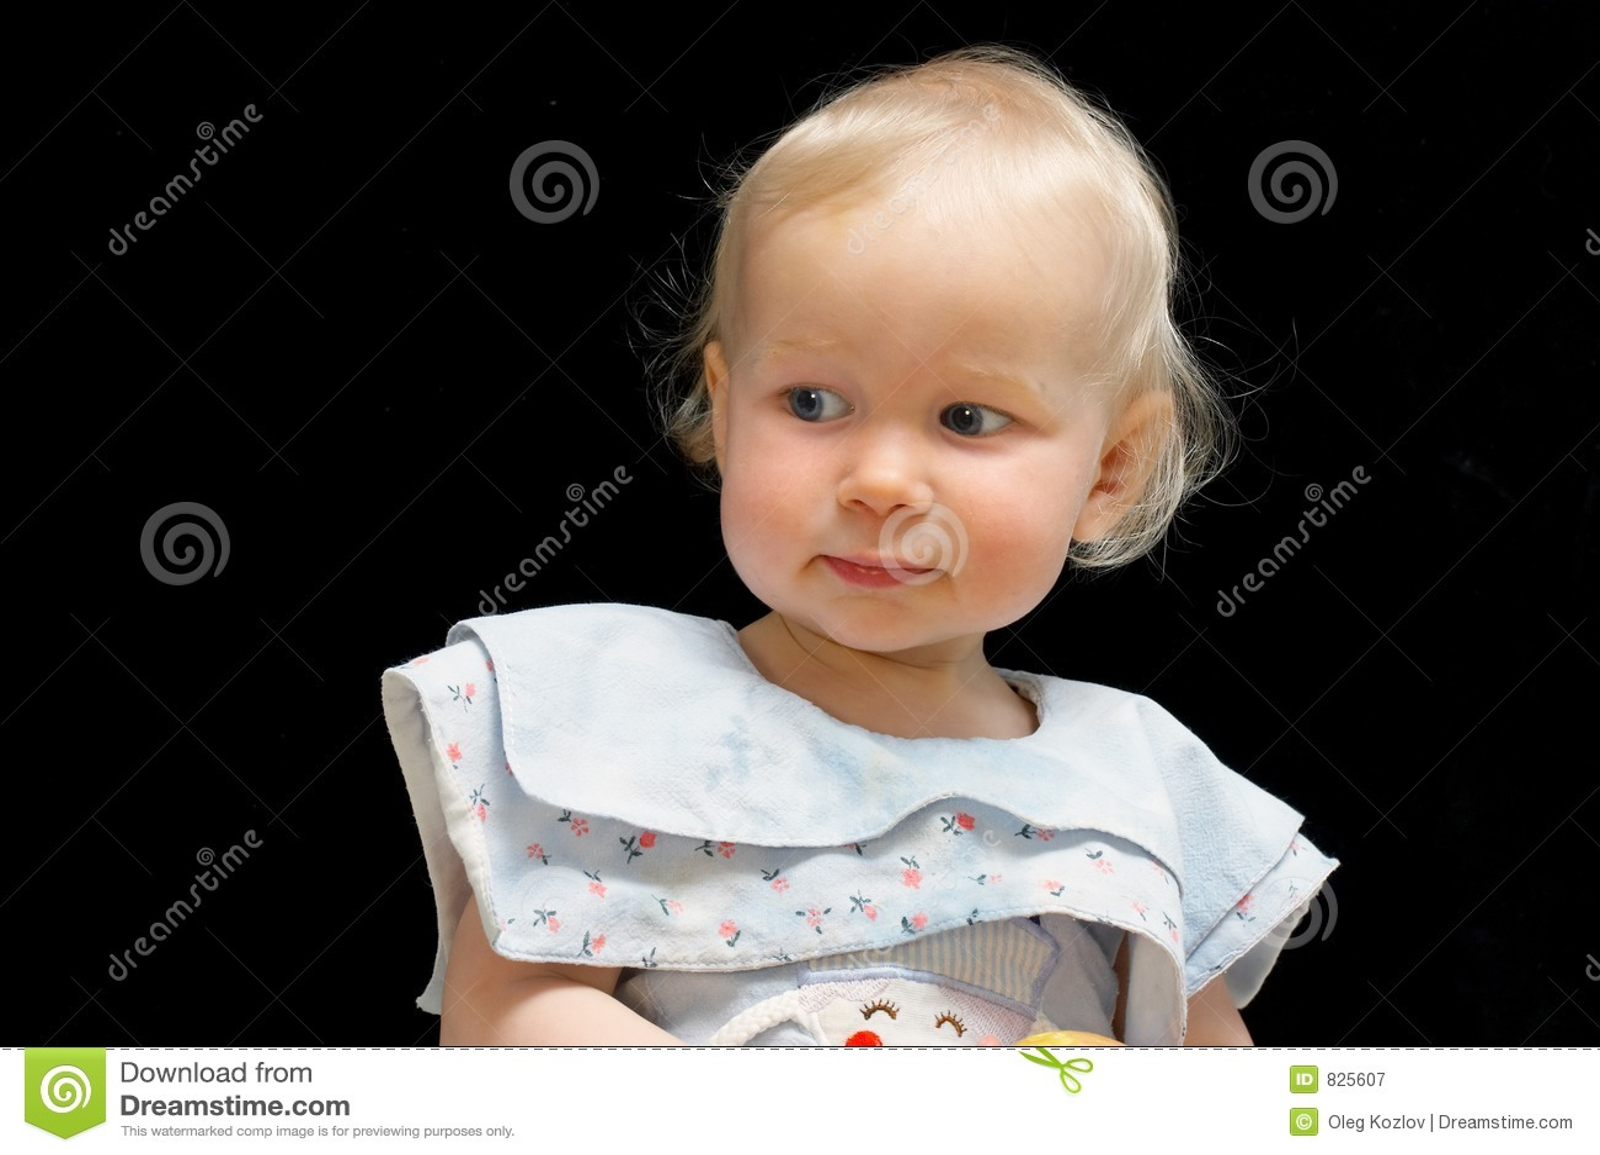 Blond haired female toddler